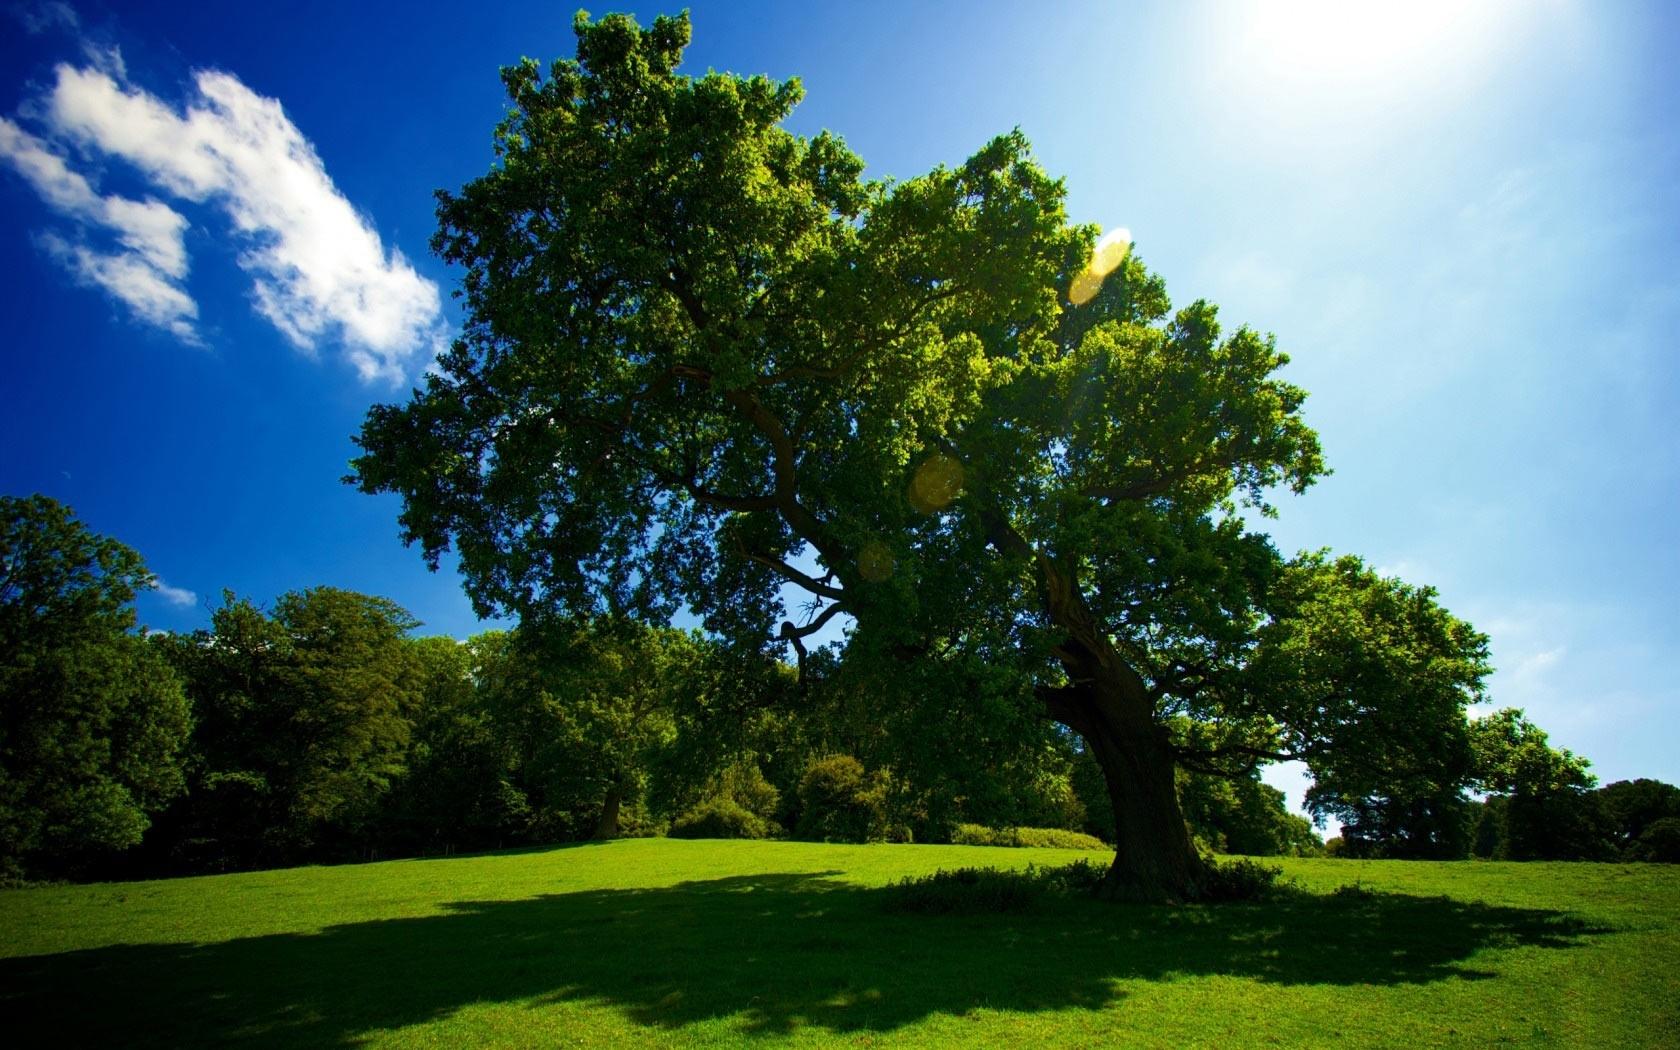 Handy-Wallpaper Landschaft, Natur, Bäume kostenlos herunterladen.